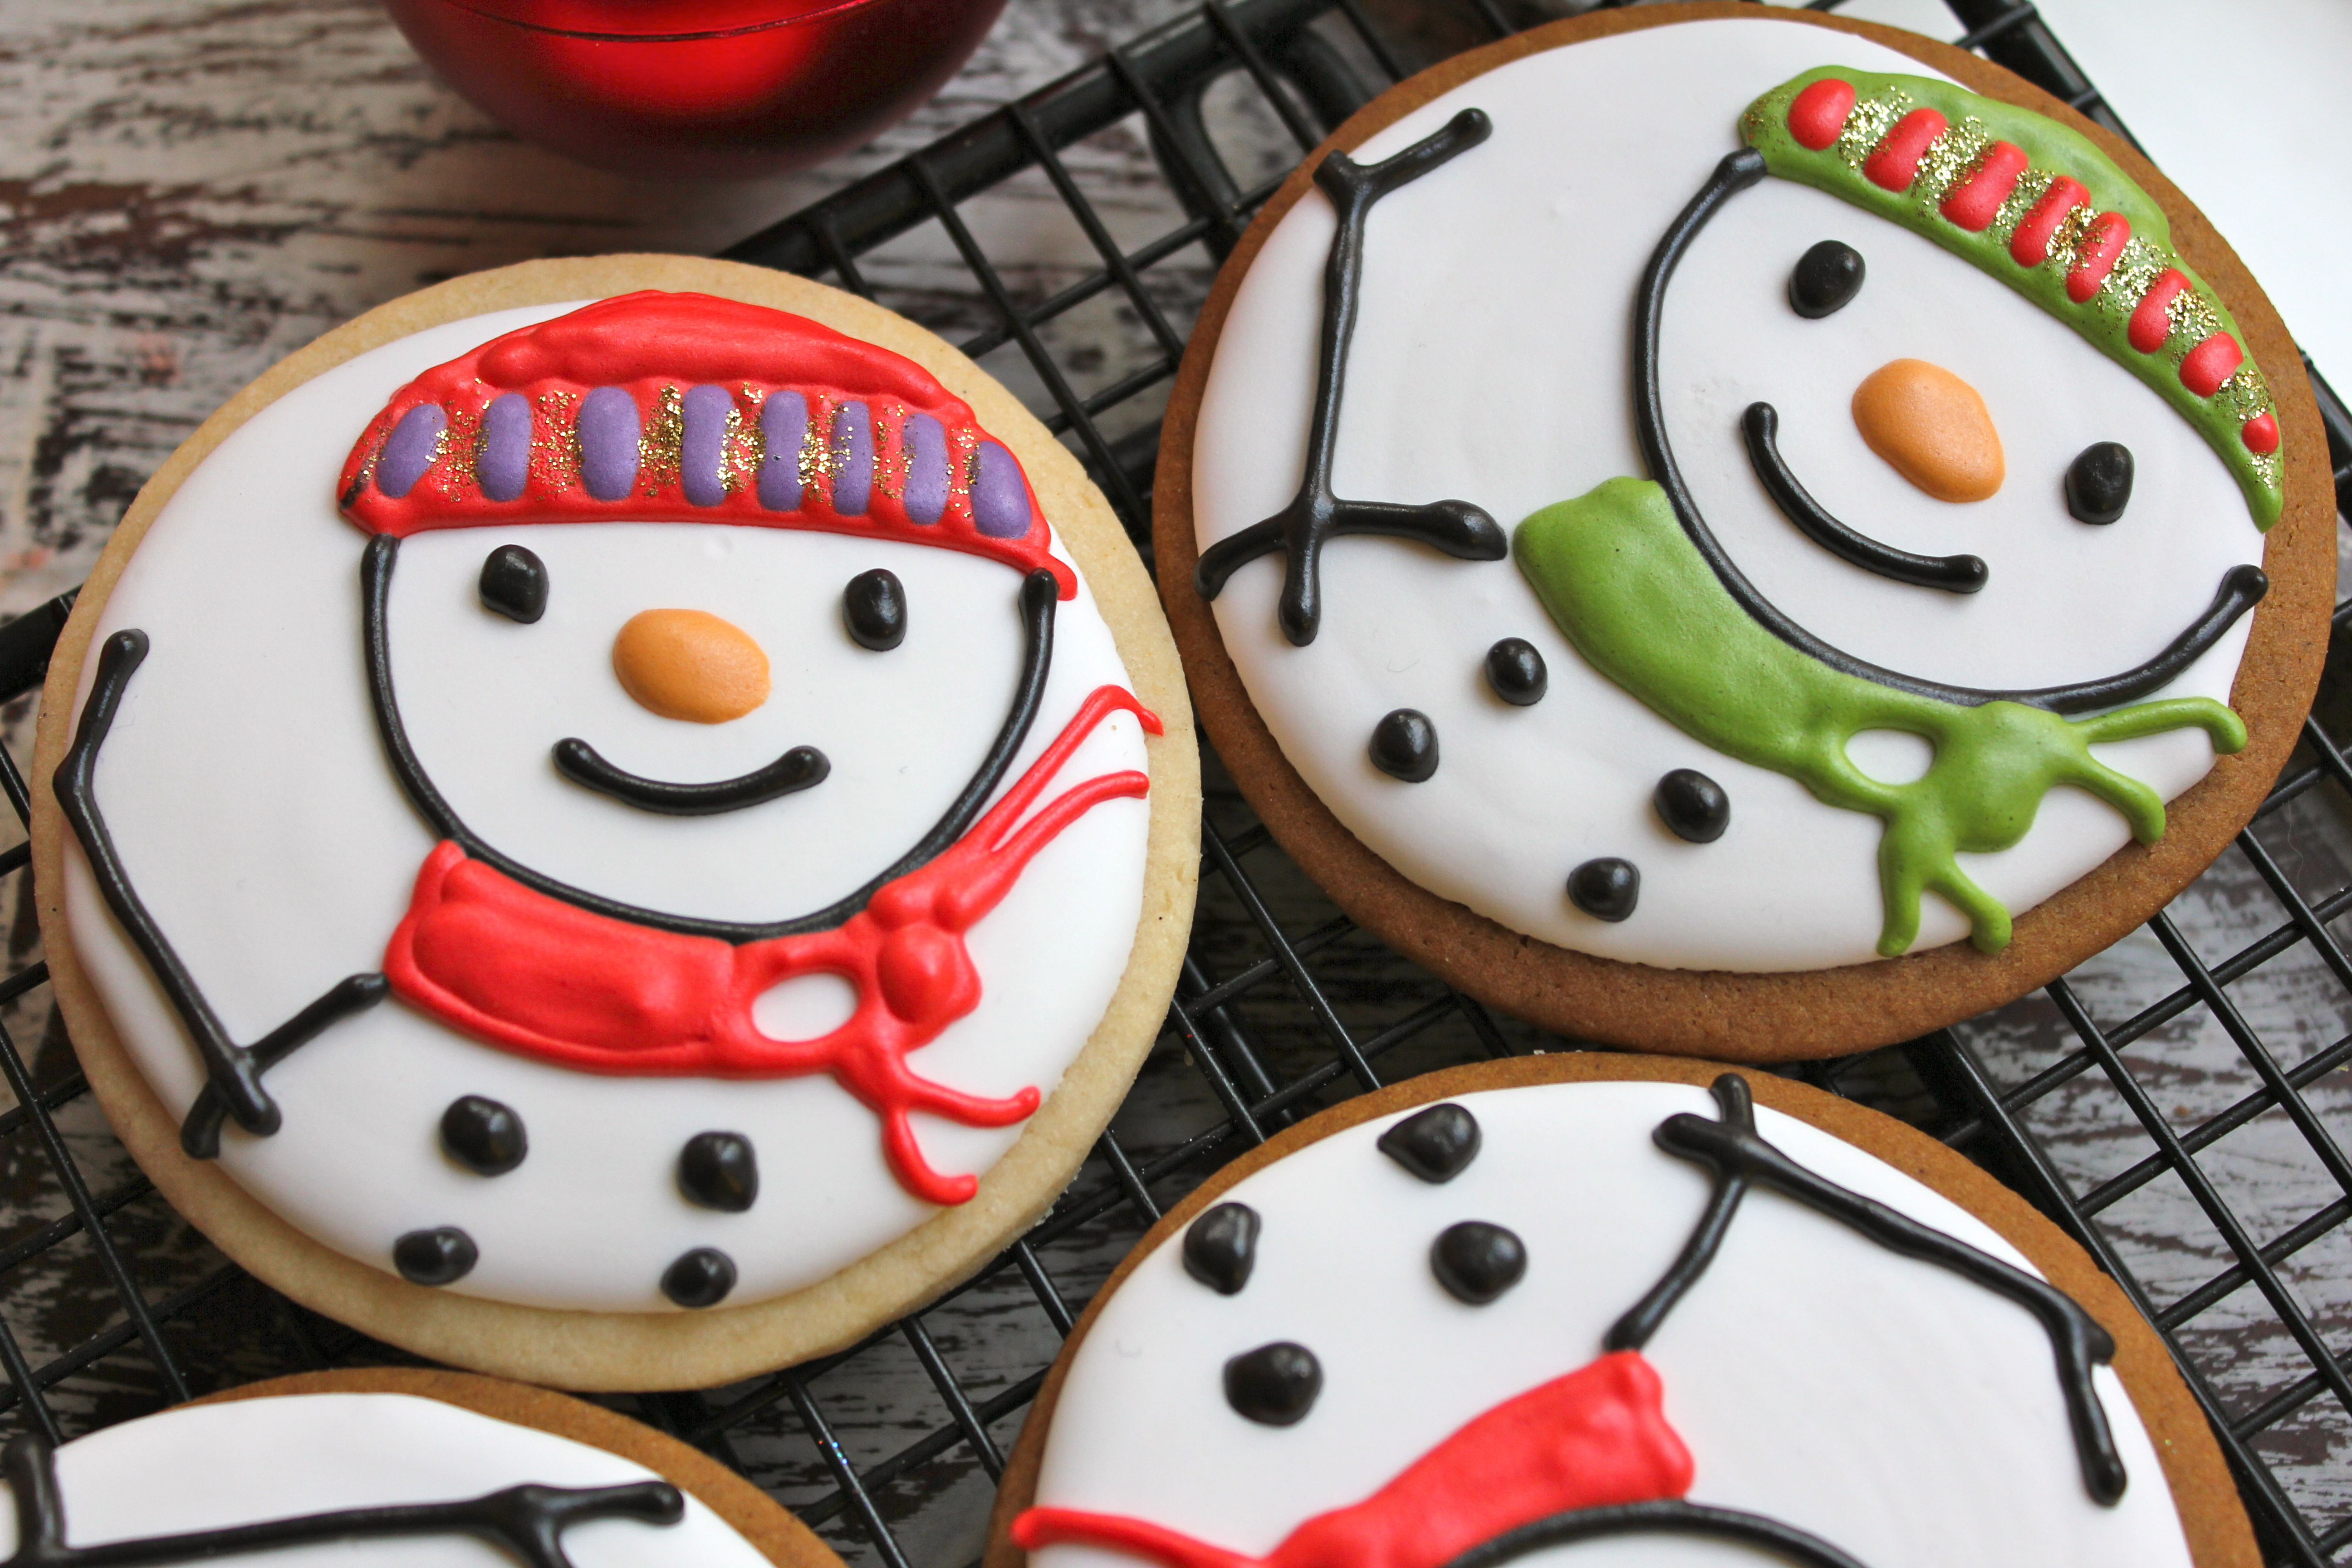 Freshly Baked Christmas Design Cookies